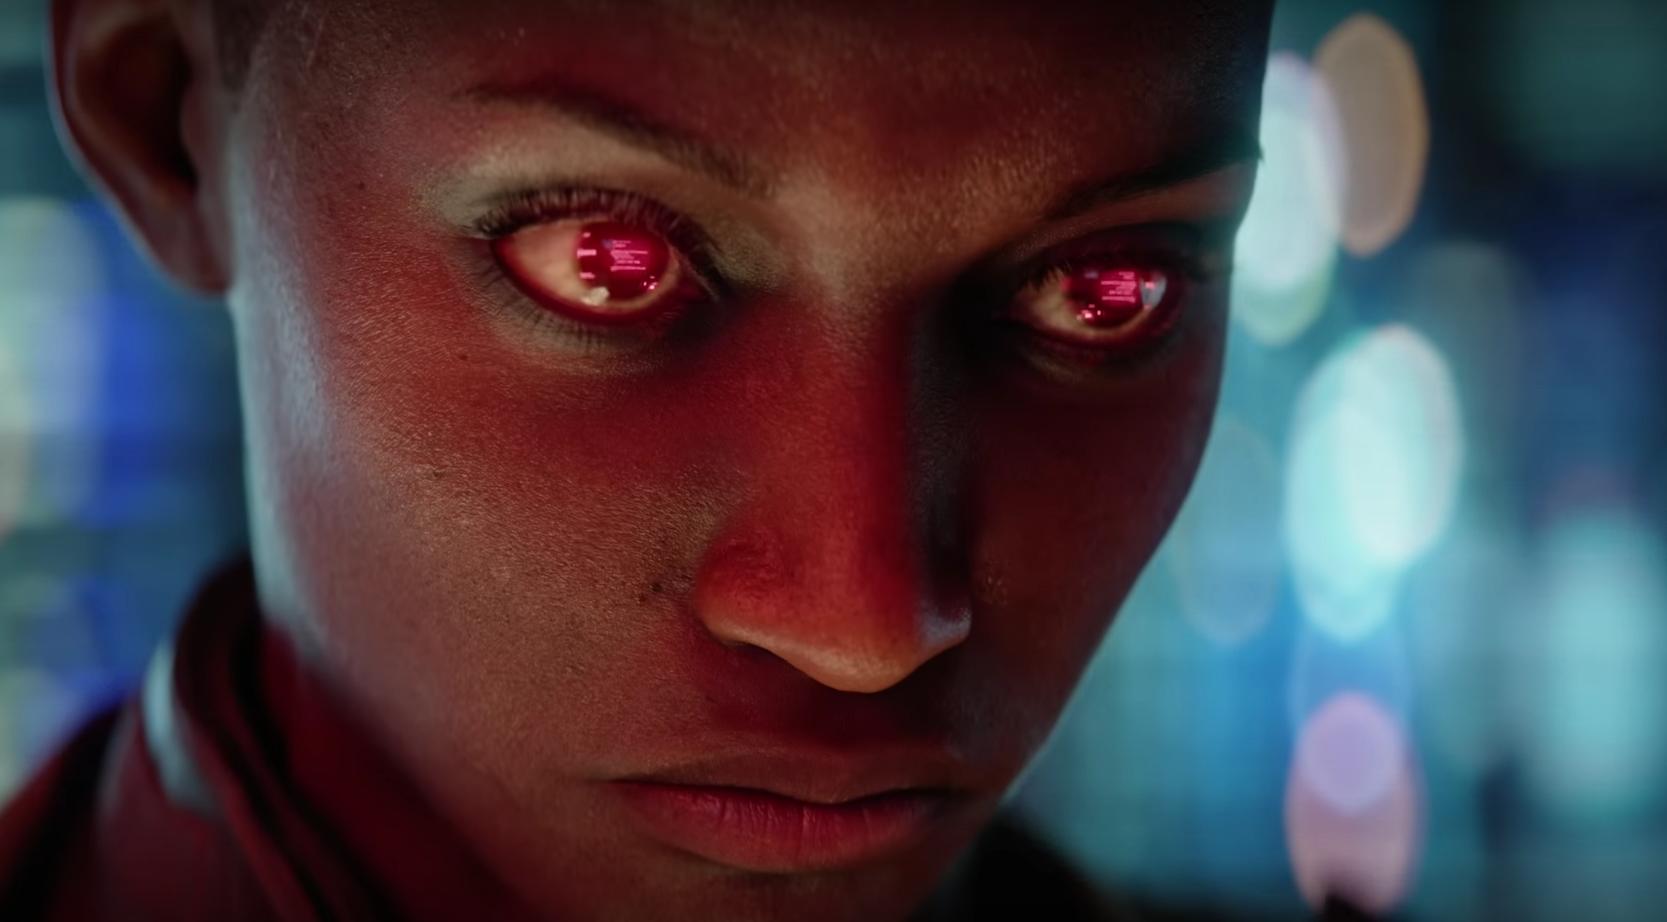 Cyberpunk 2077's E3 demo leans on unimaginative stereotypes